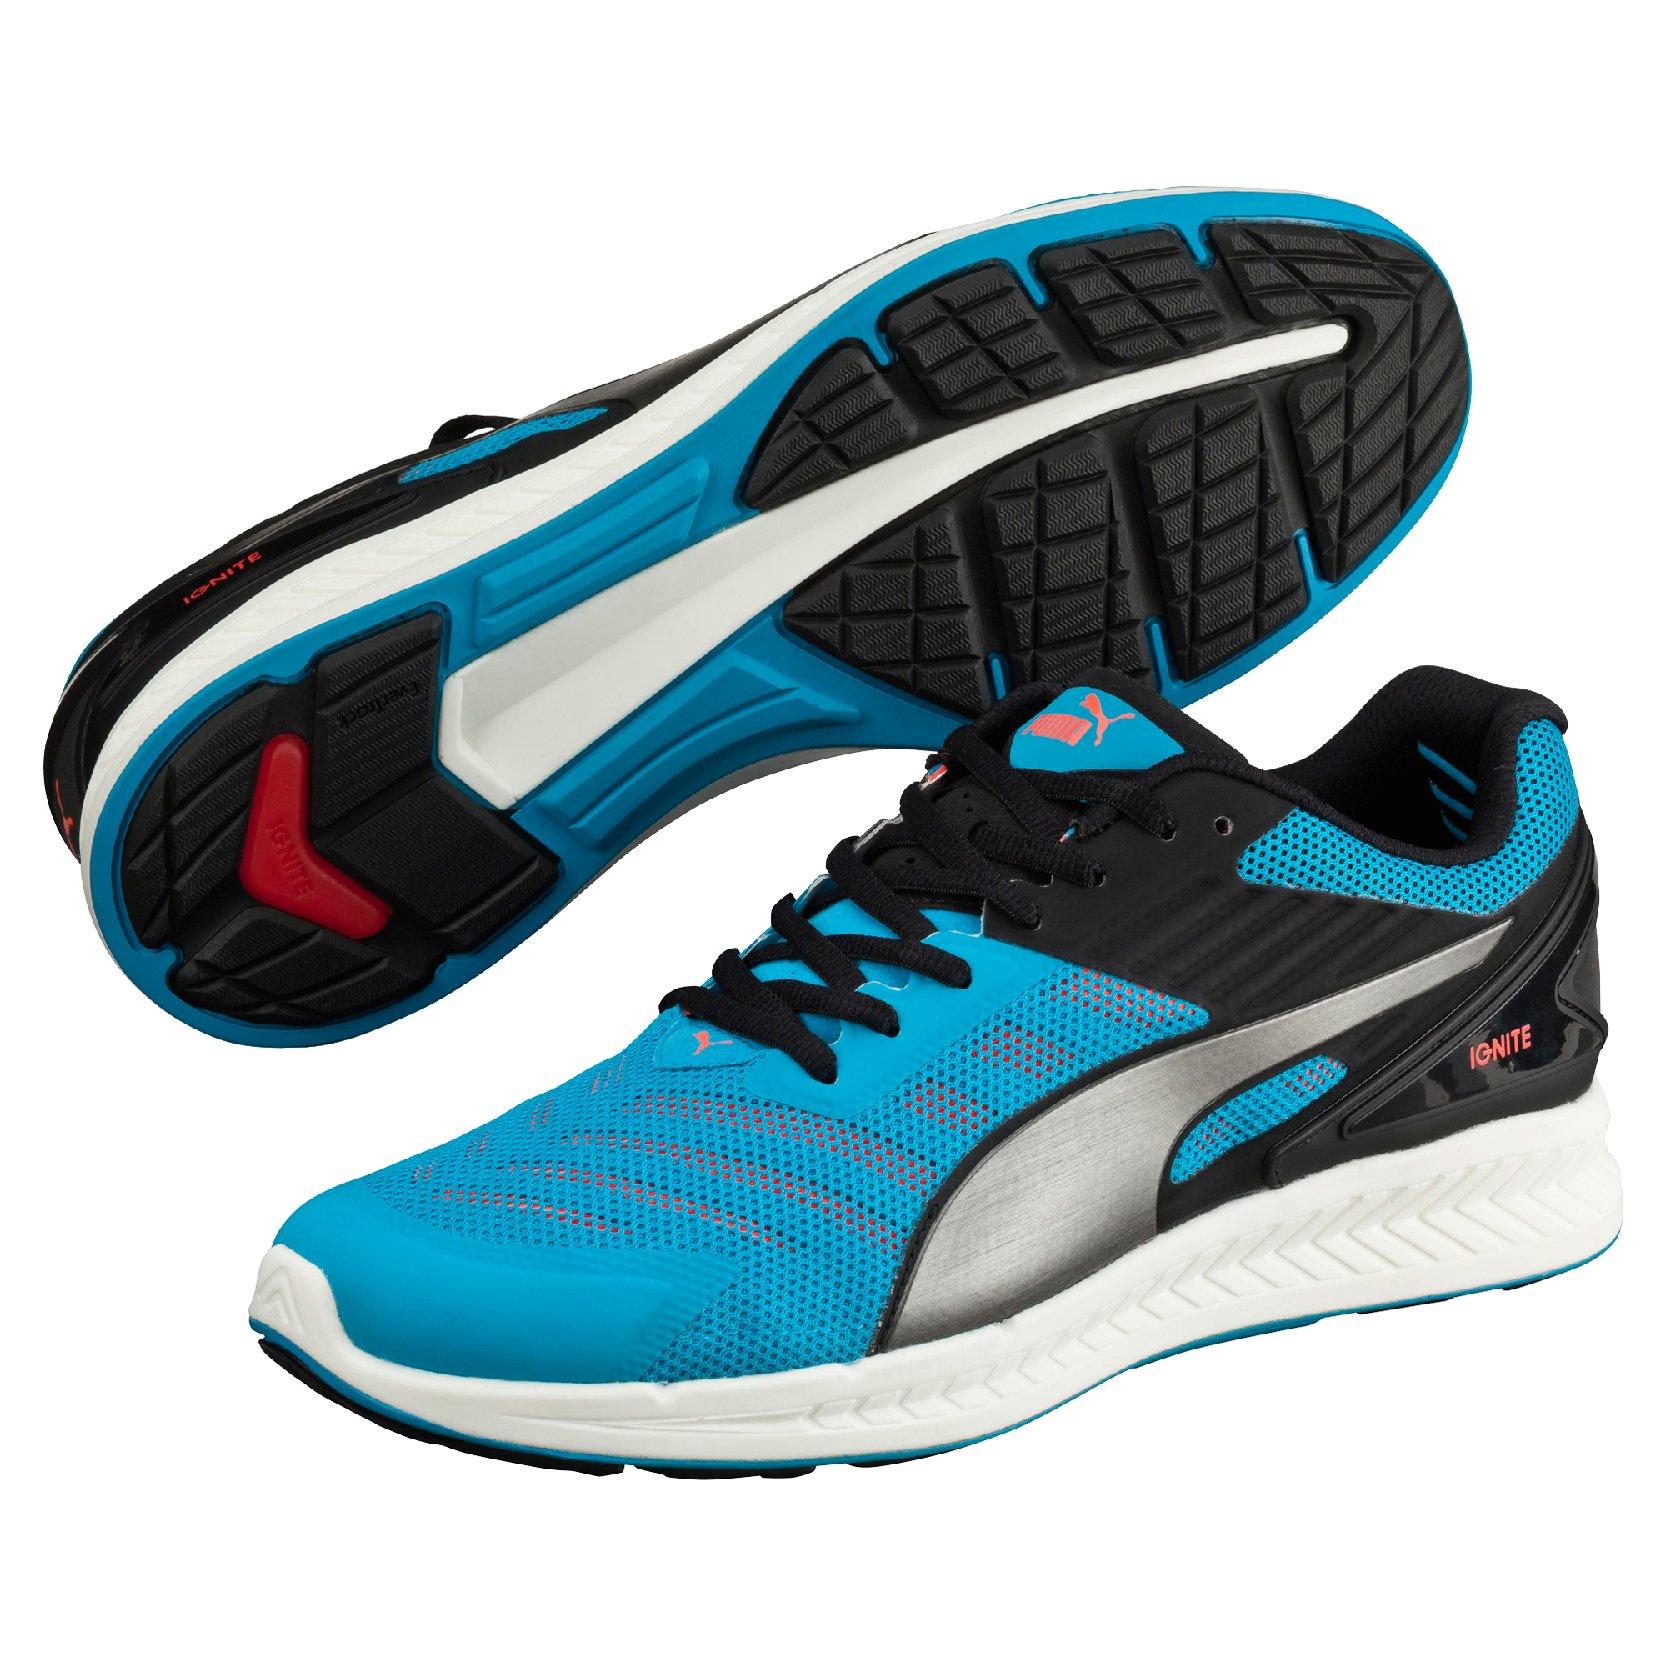 Běžecké boty Puma IGNITE v2 atomic blue-aged silver-red bl